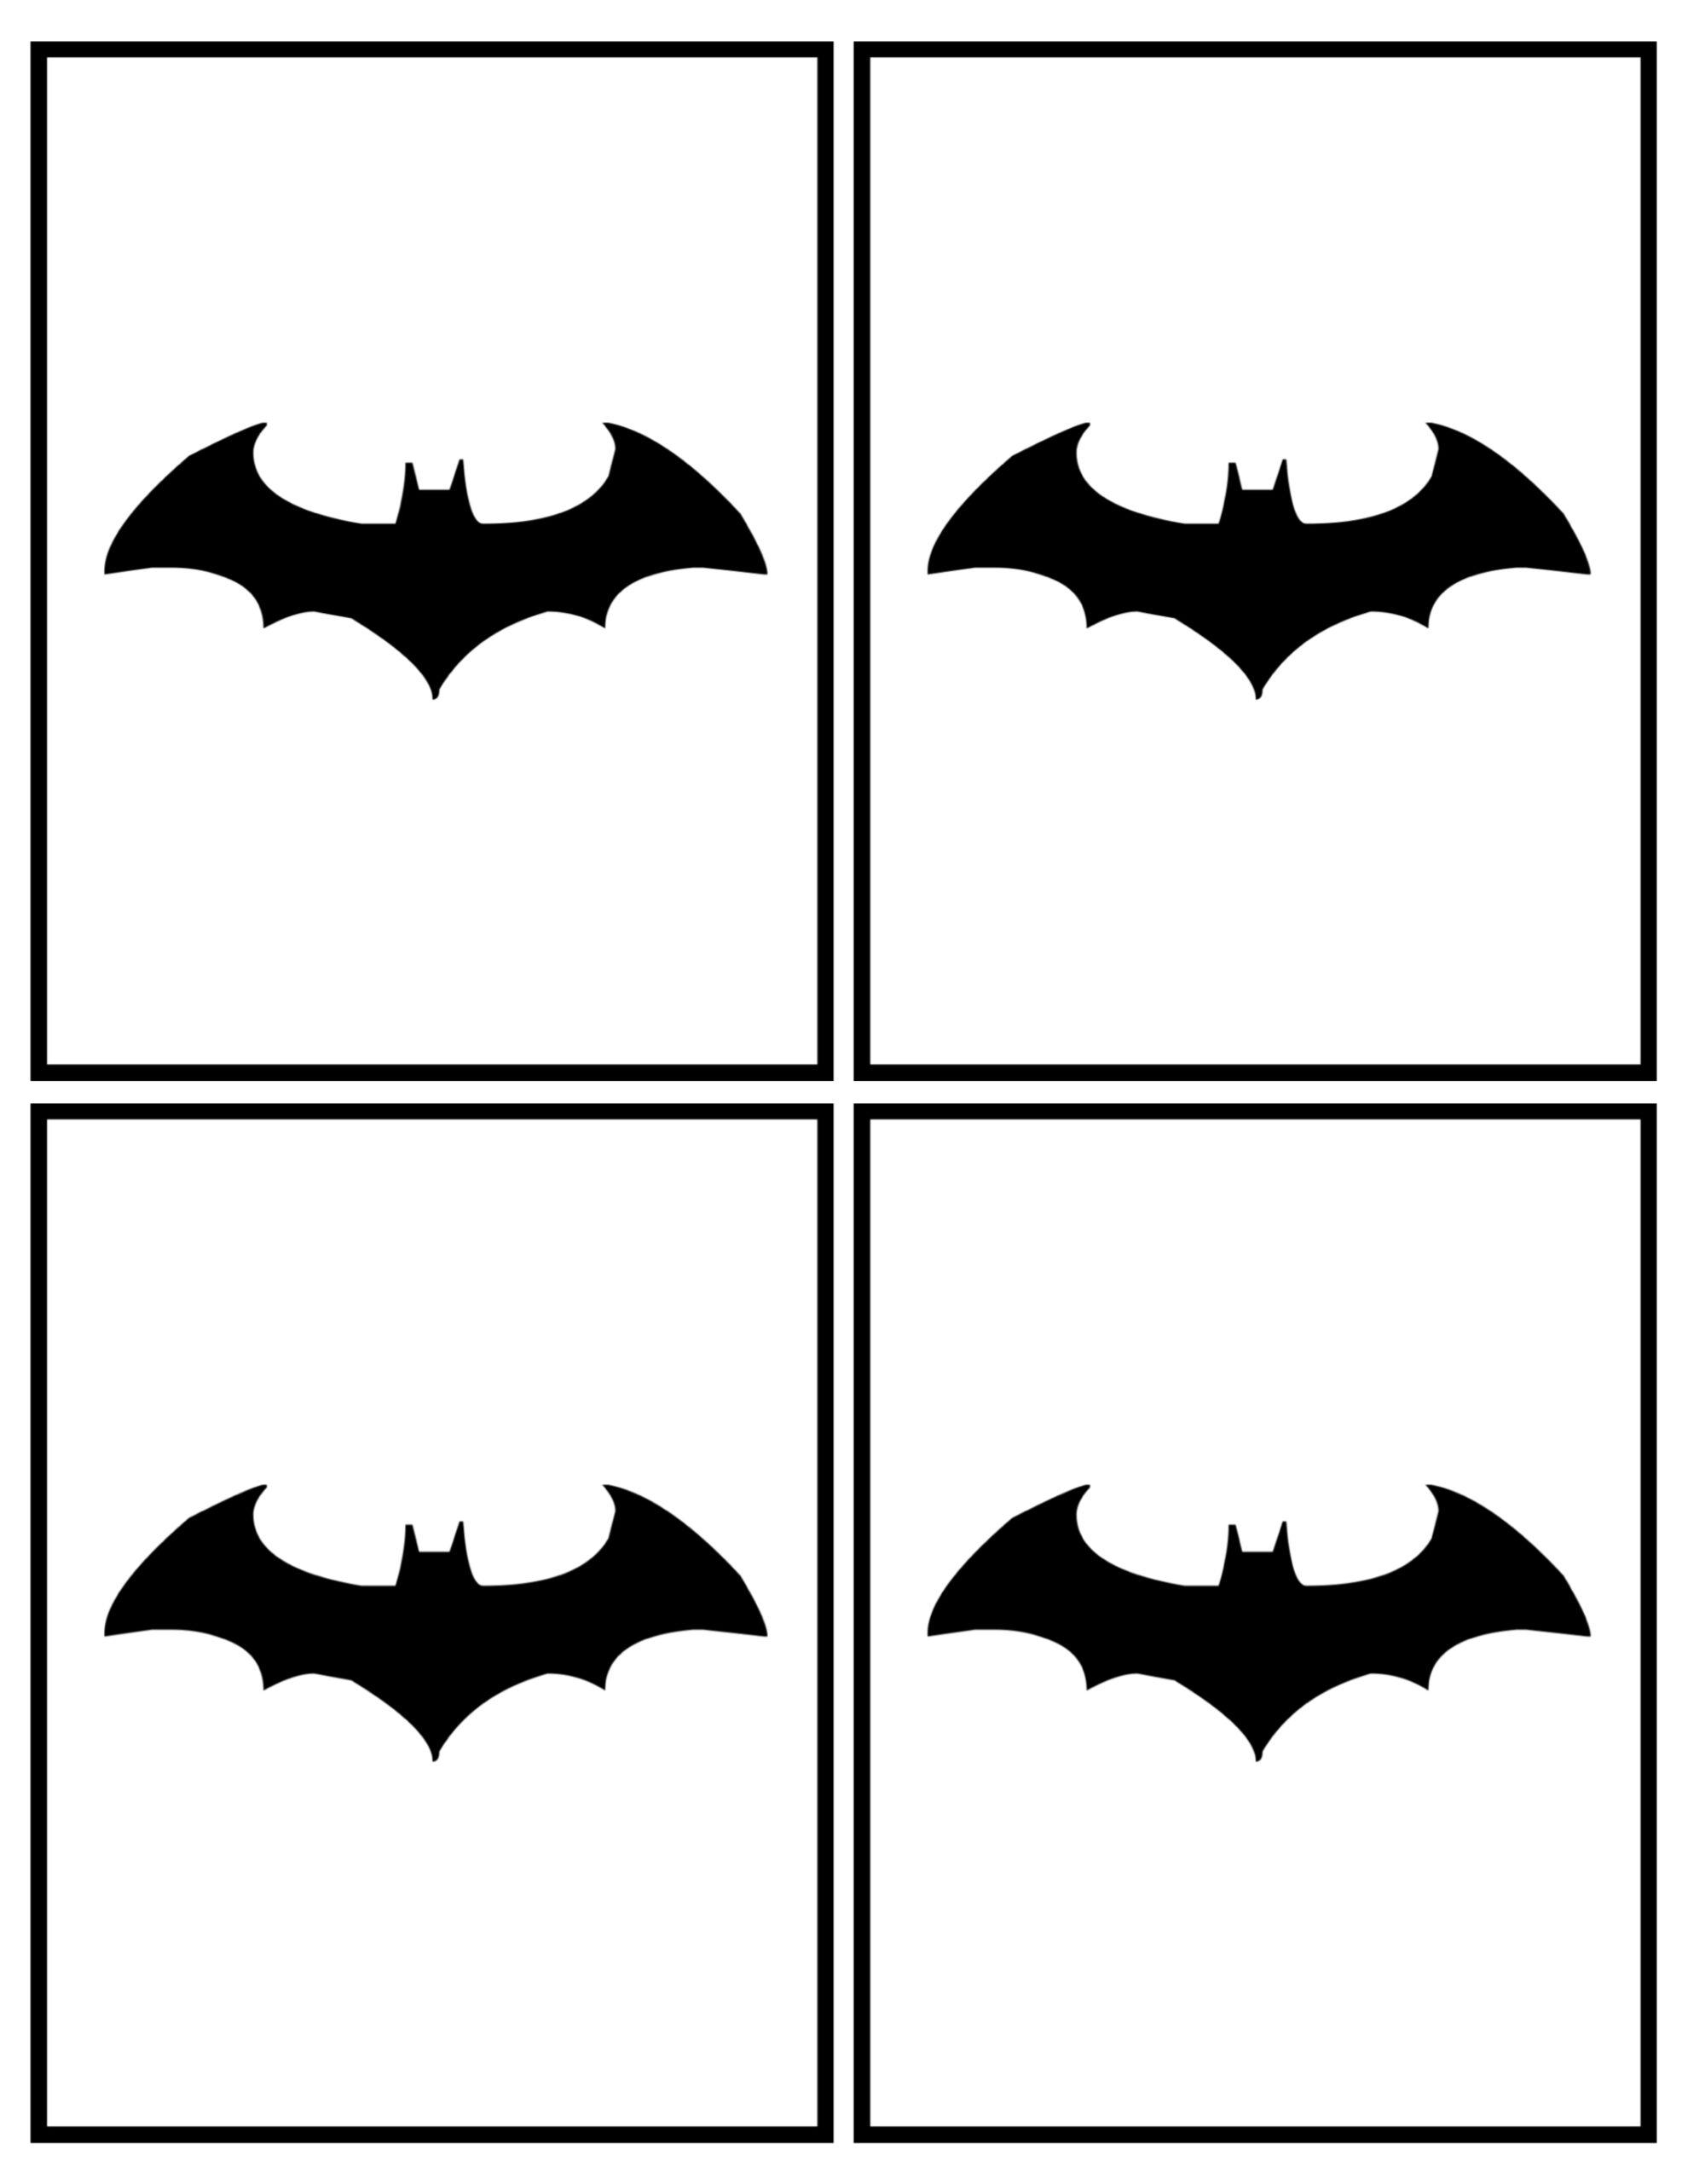 Batman Banner (Just Bats)